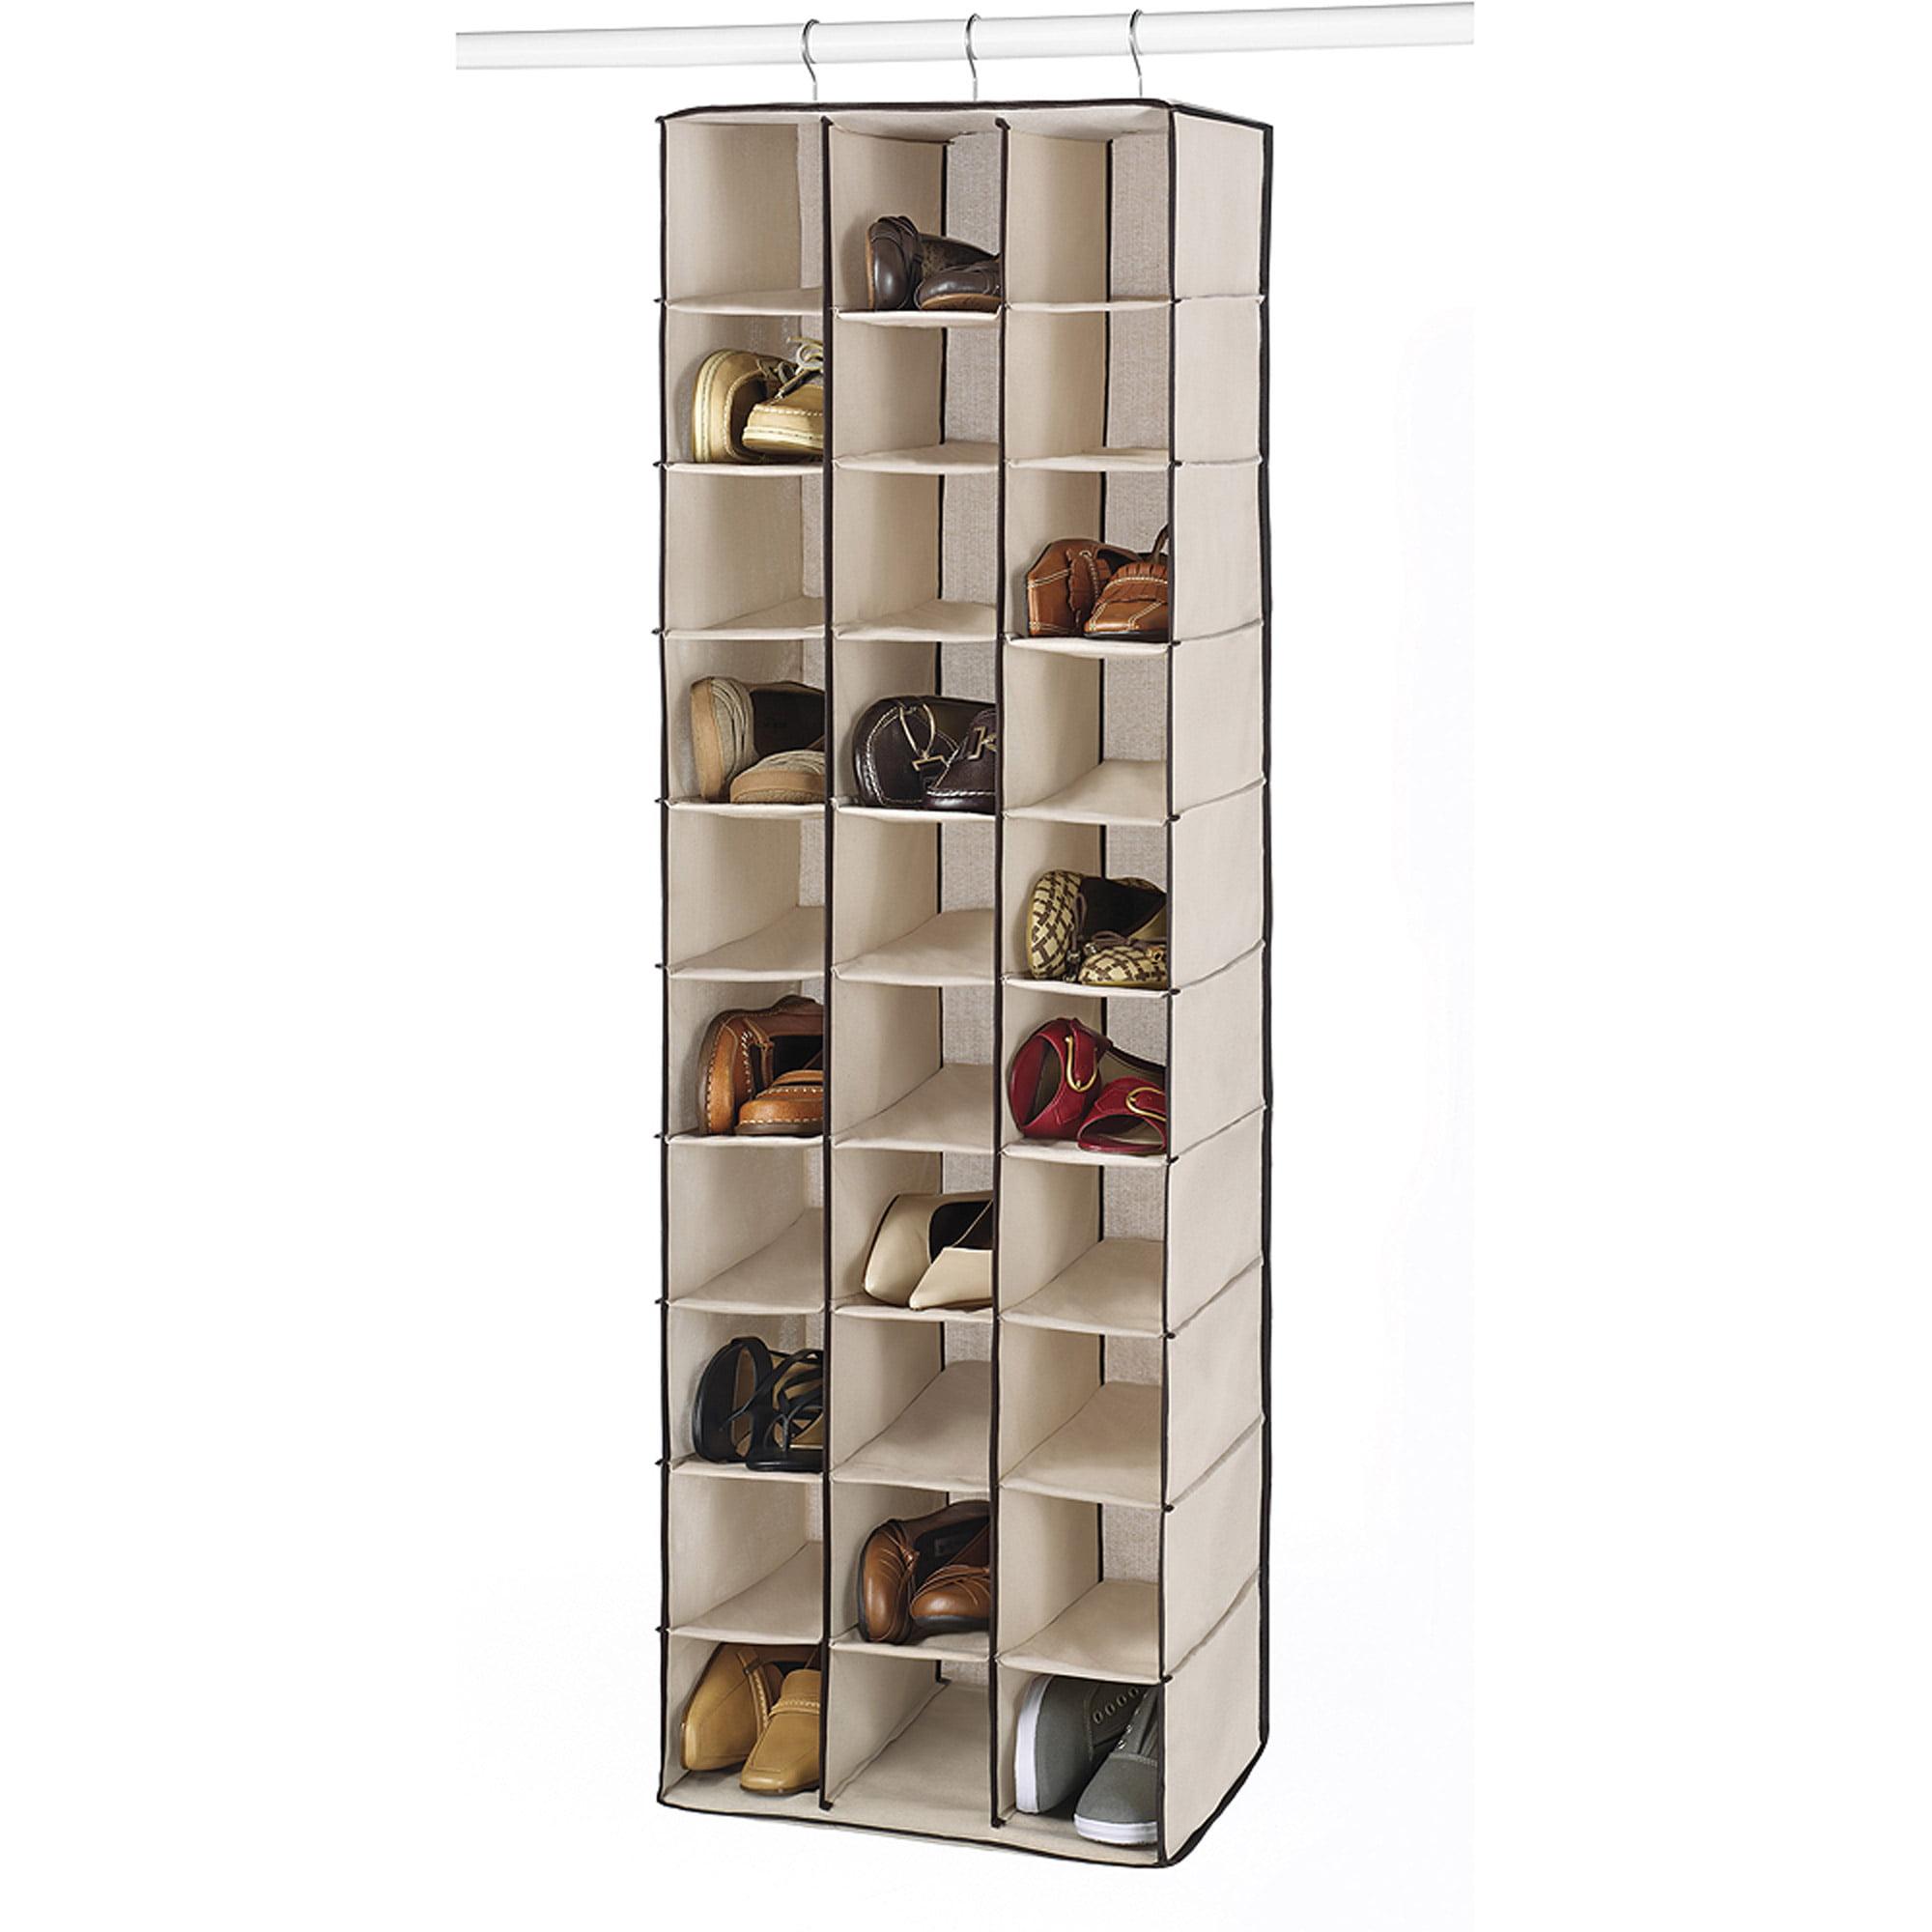 Whitmor 30-Section Hanging Shoe Shelves, Tan Espresso by Whitmor Inc